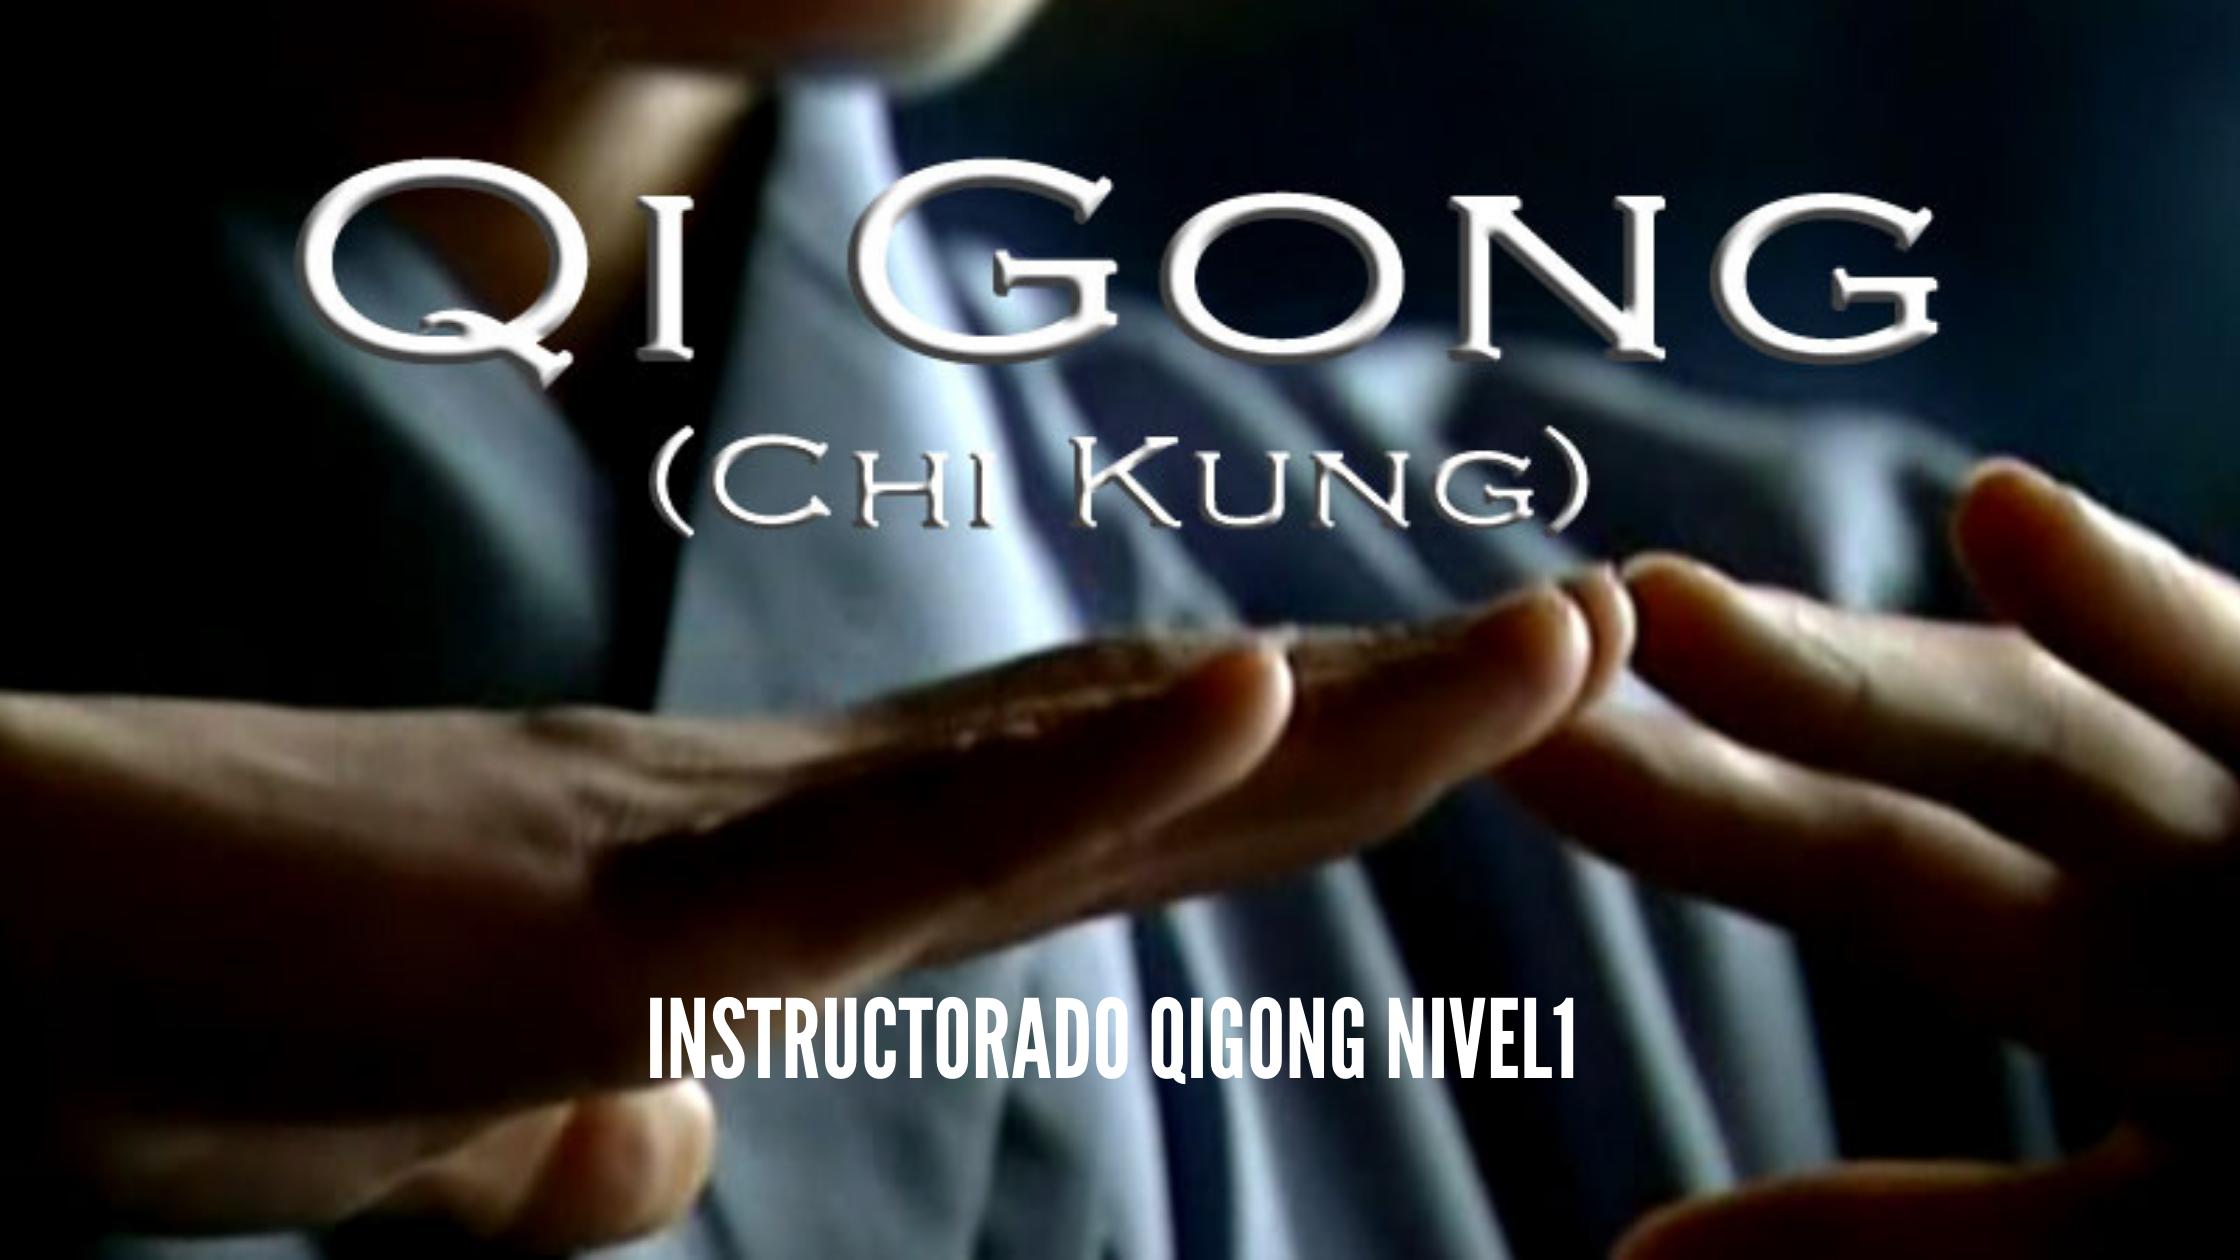 Instructorado Qigong nivel 1 septiembre 2021